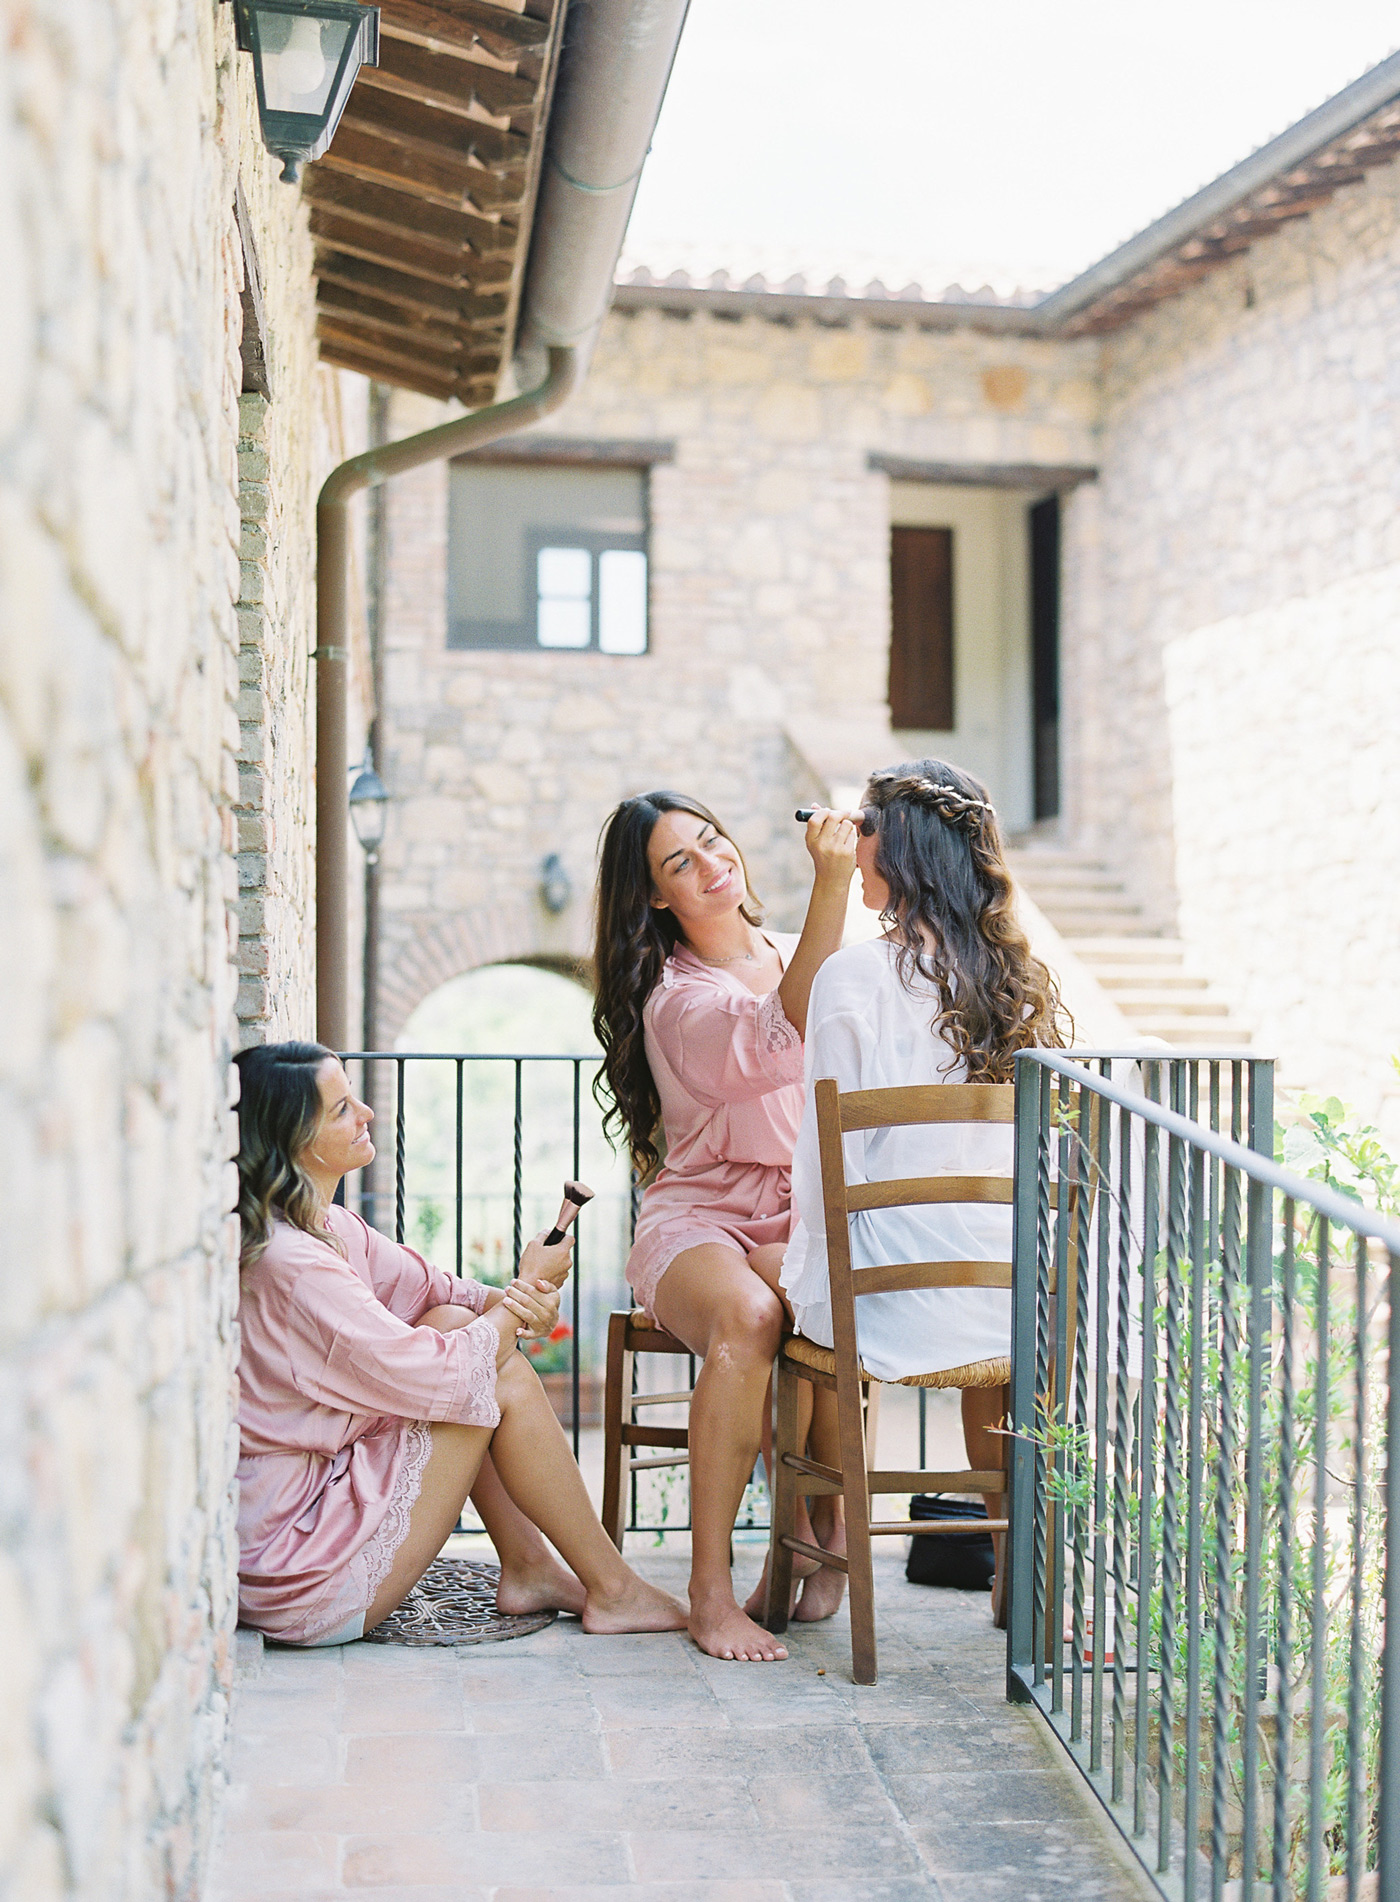 bridesmaid doing brides makeup outside balcony